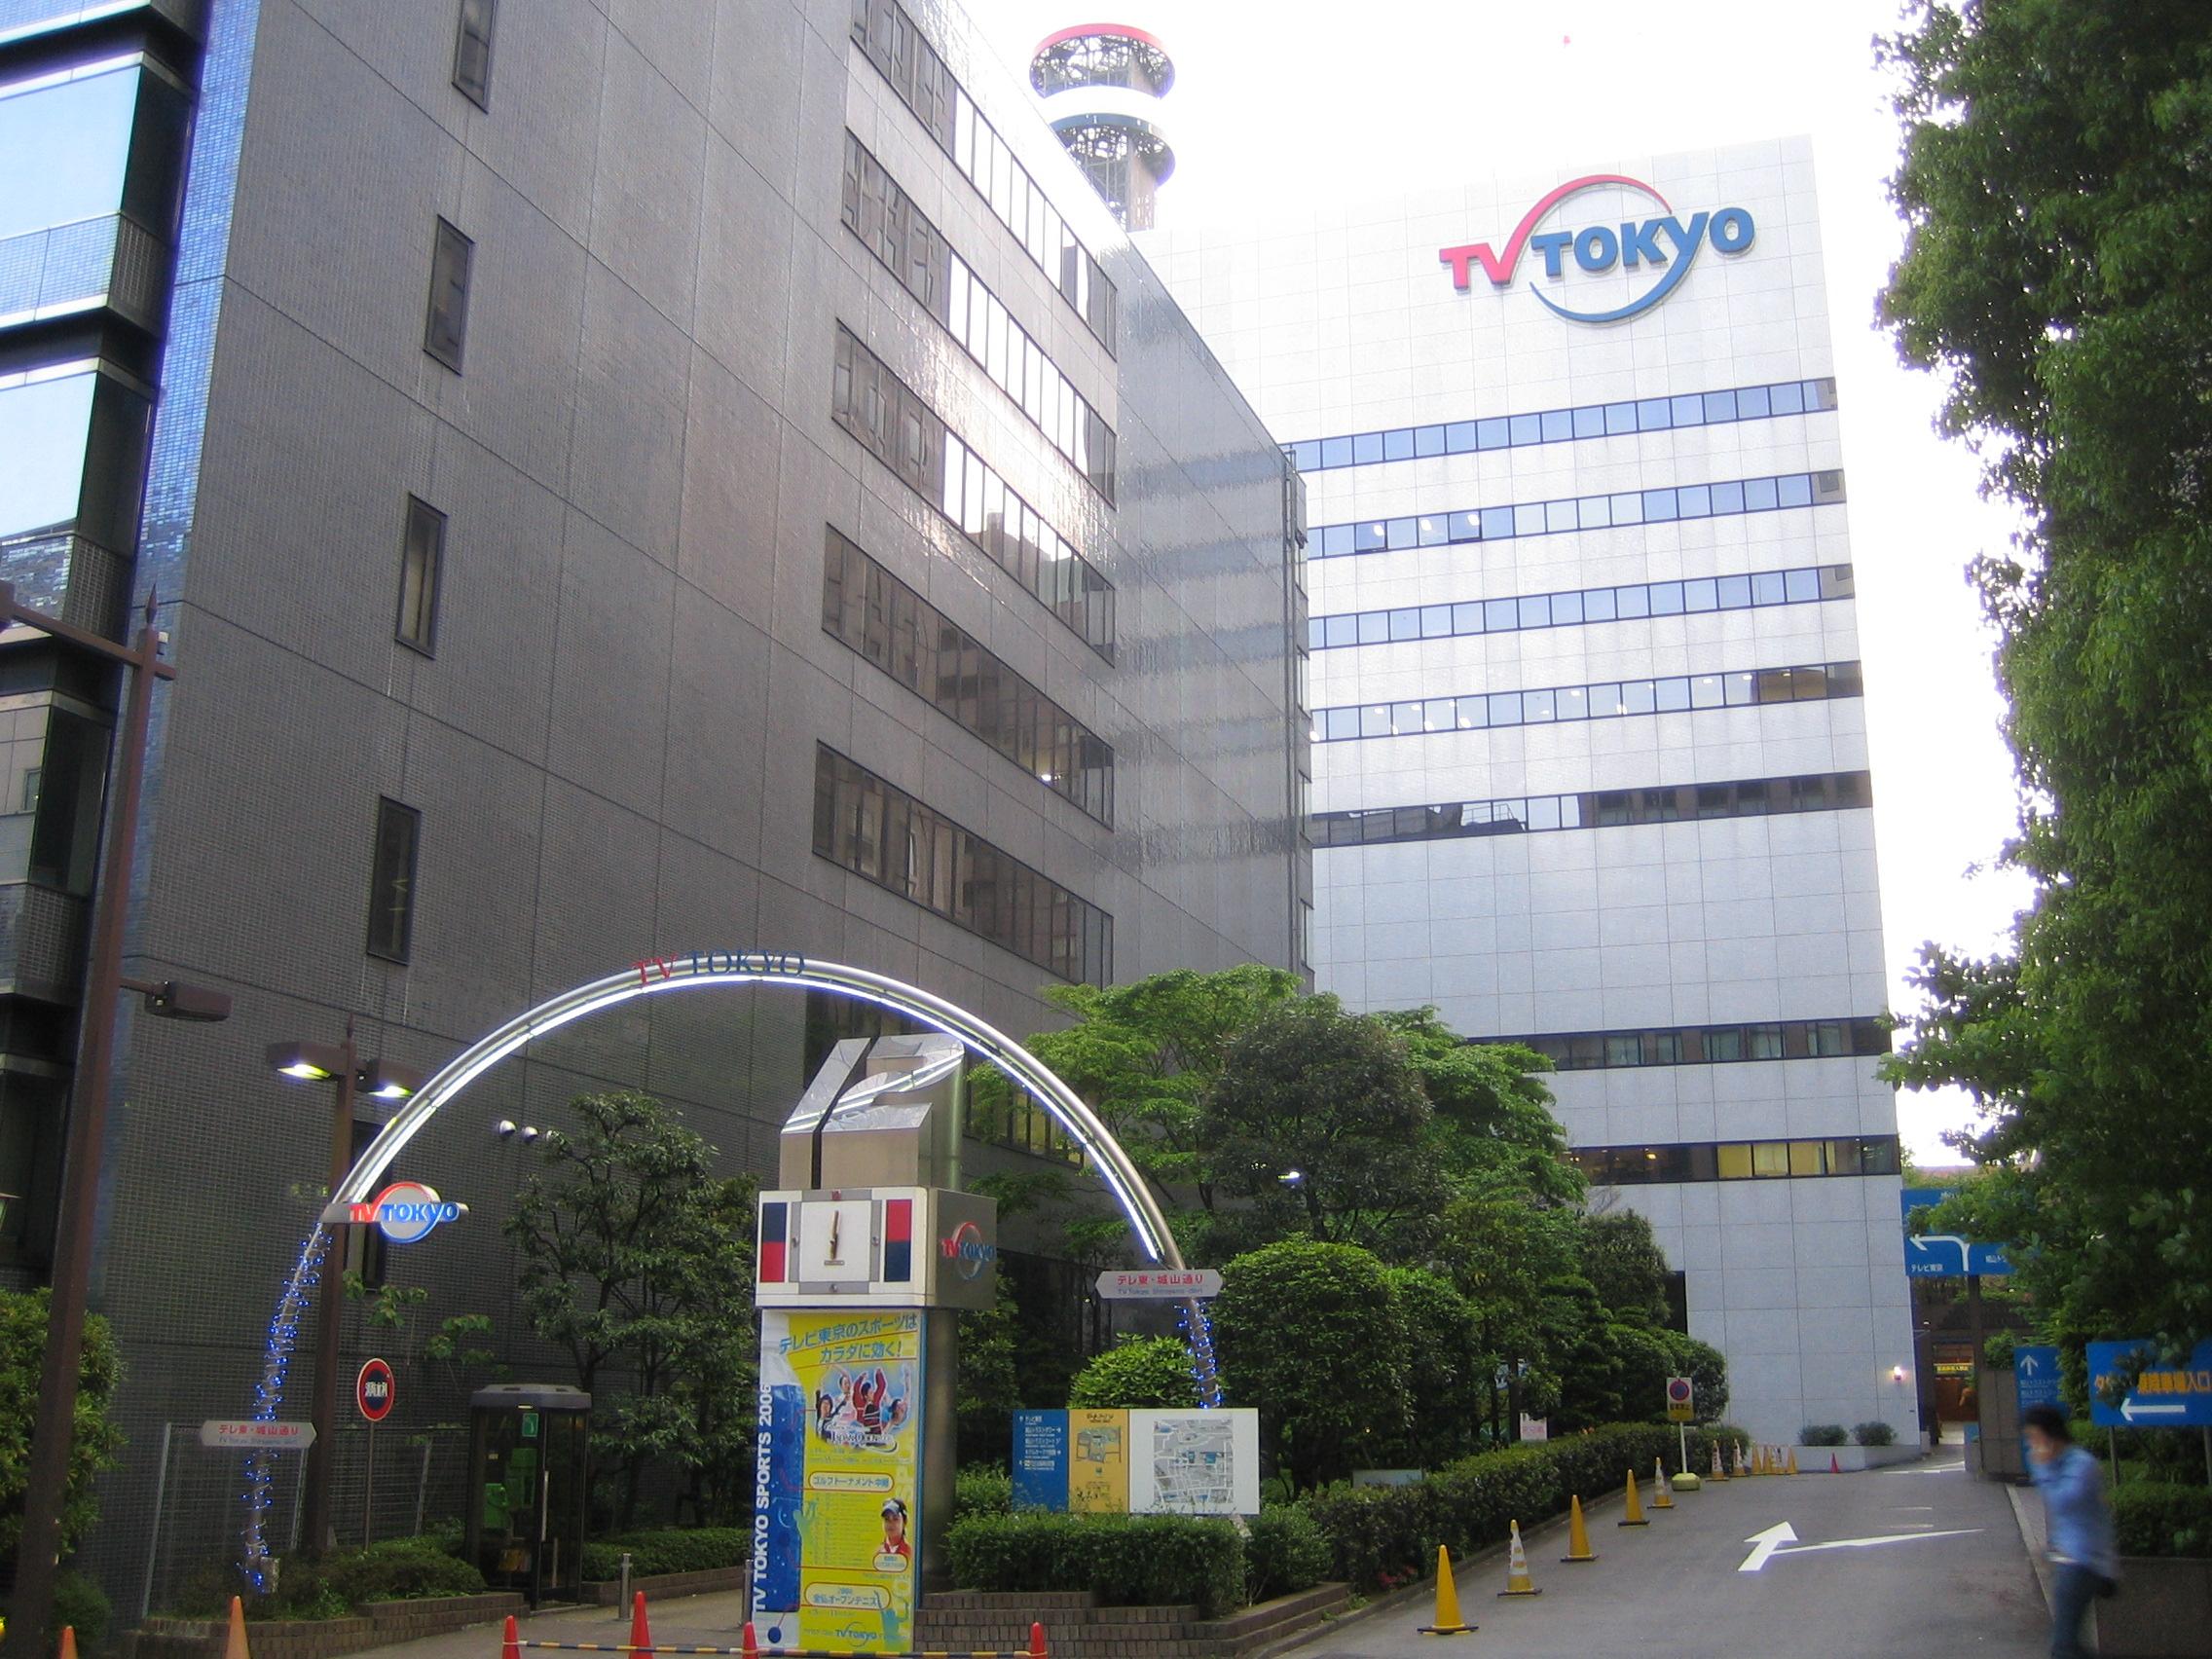 TV Tokyo head office